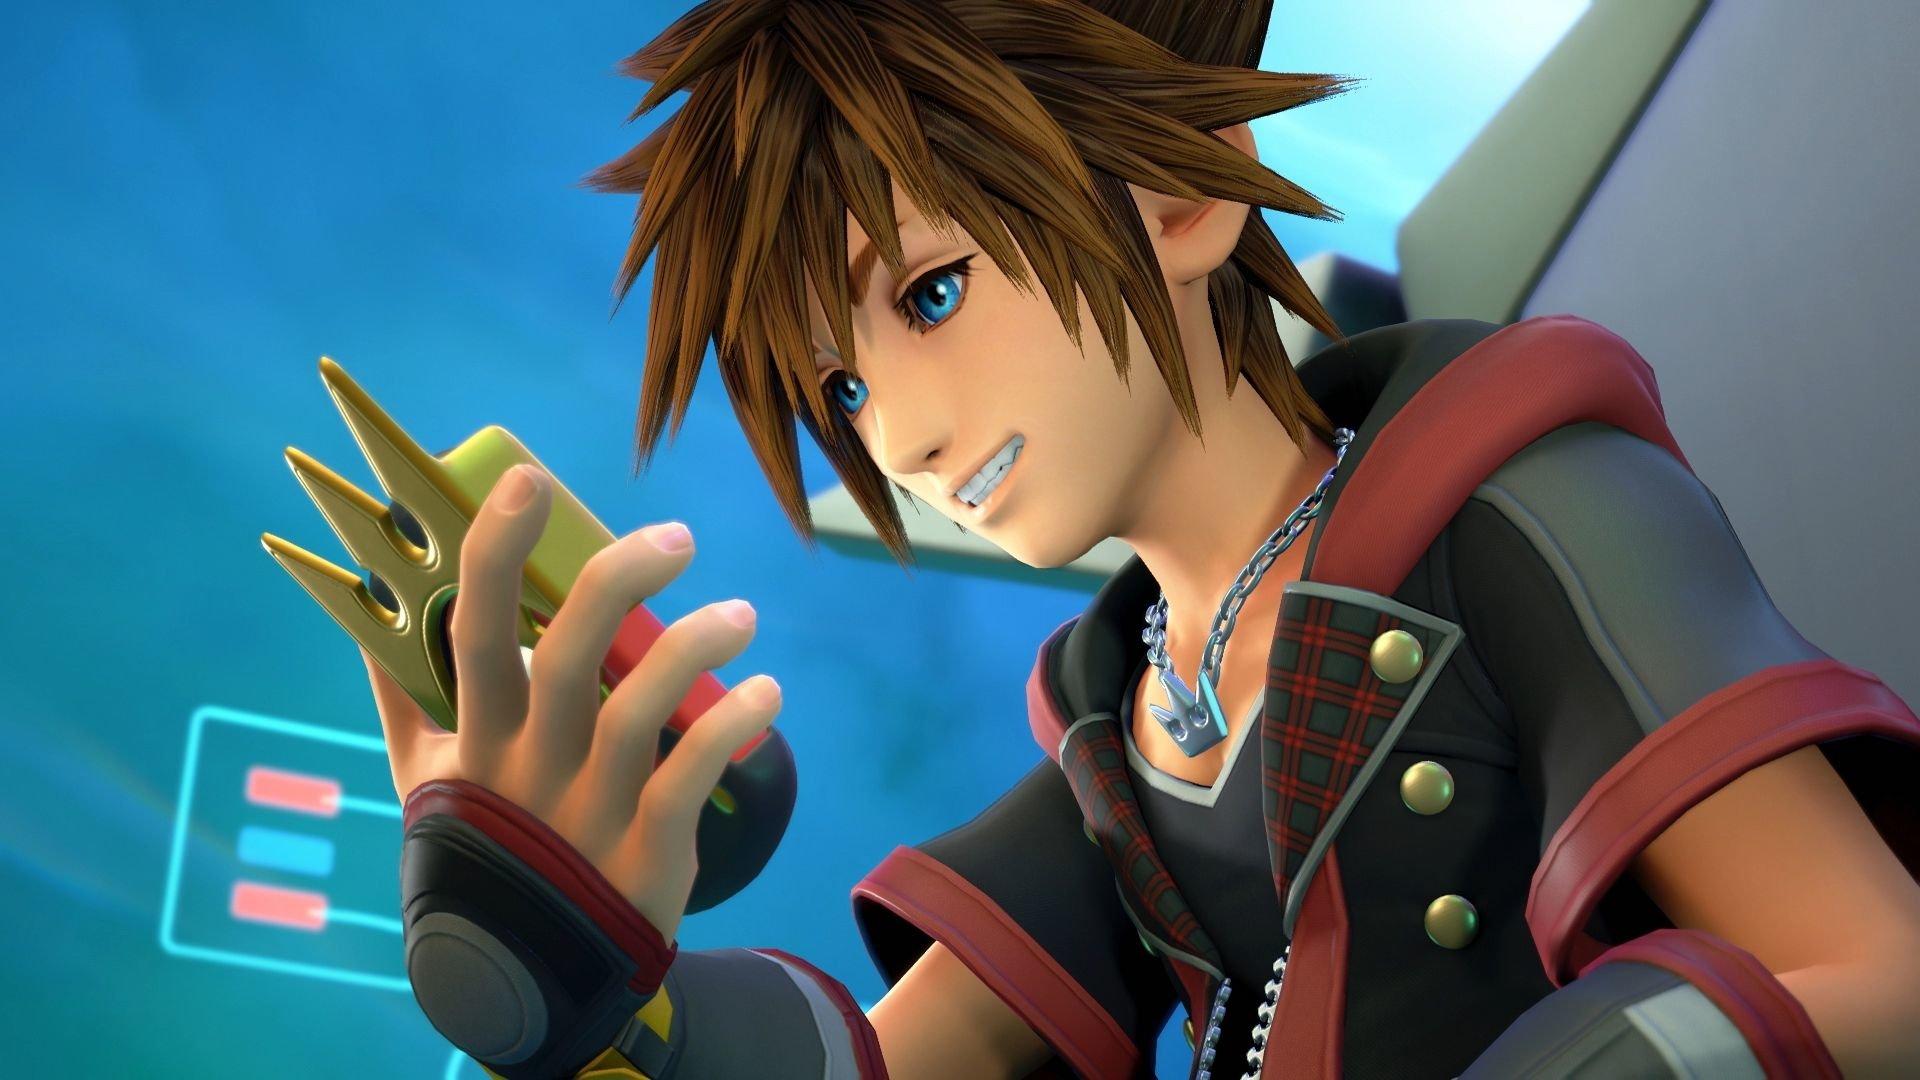 Kingdom Hearts Iii Sora Hd Wallpaper Background Image